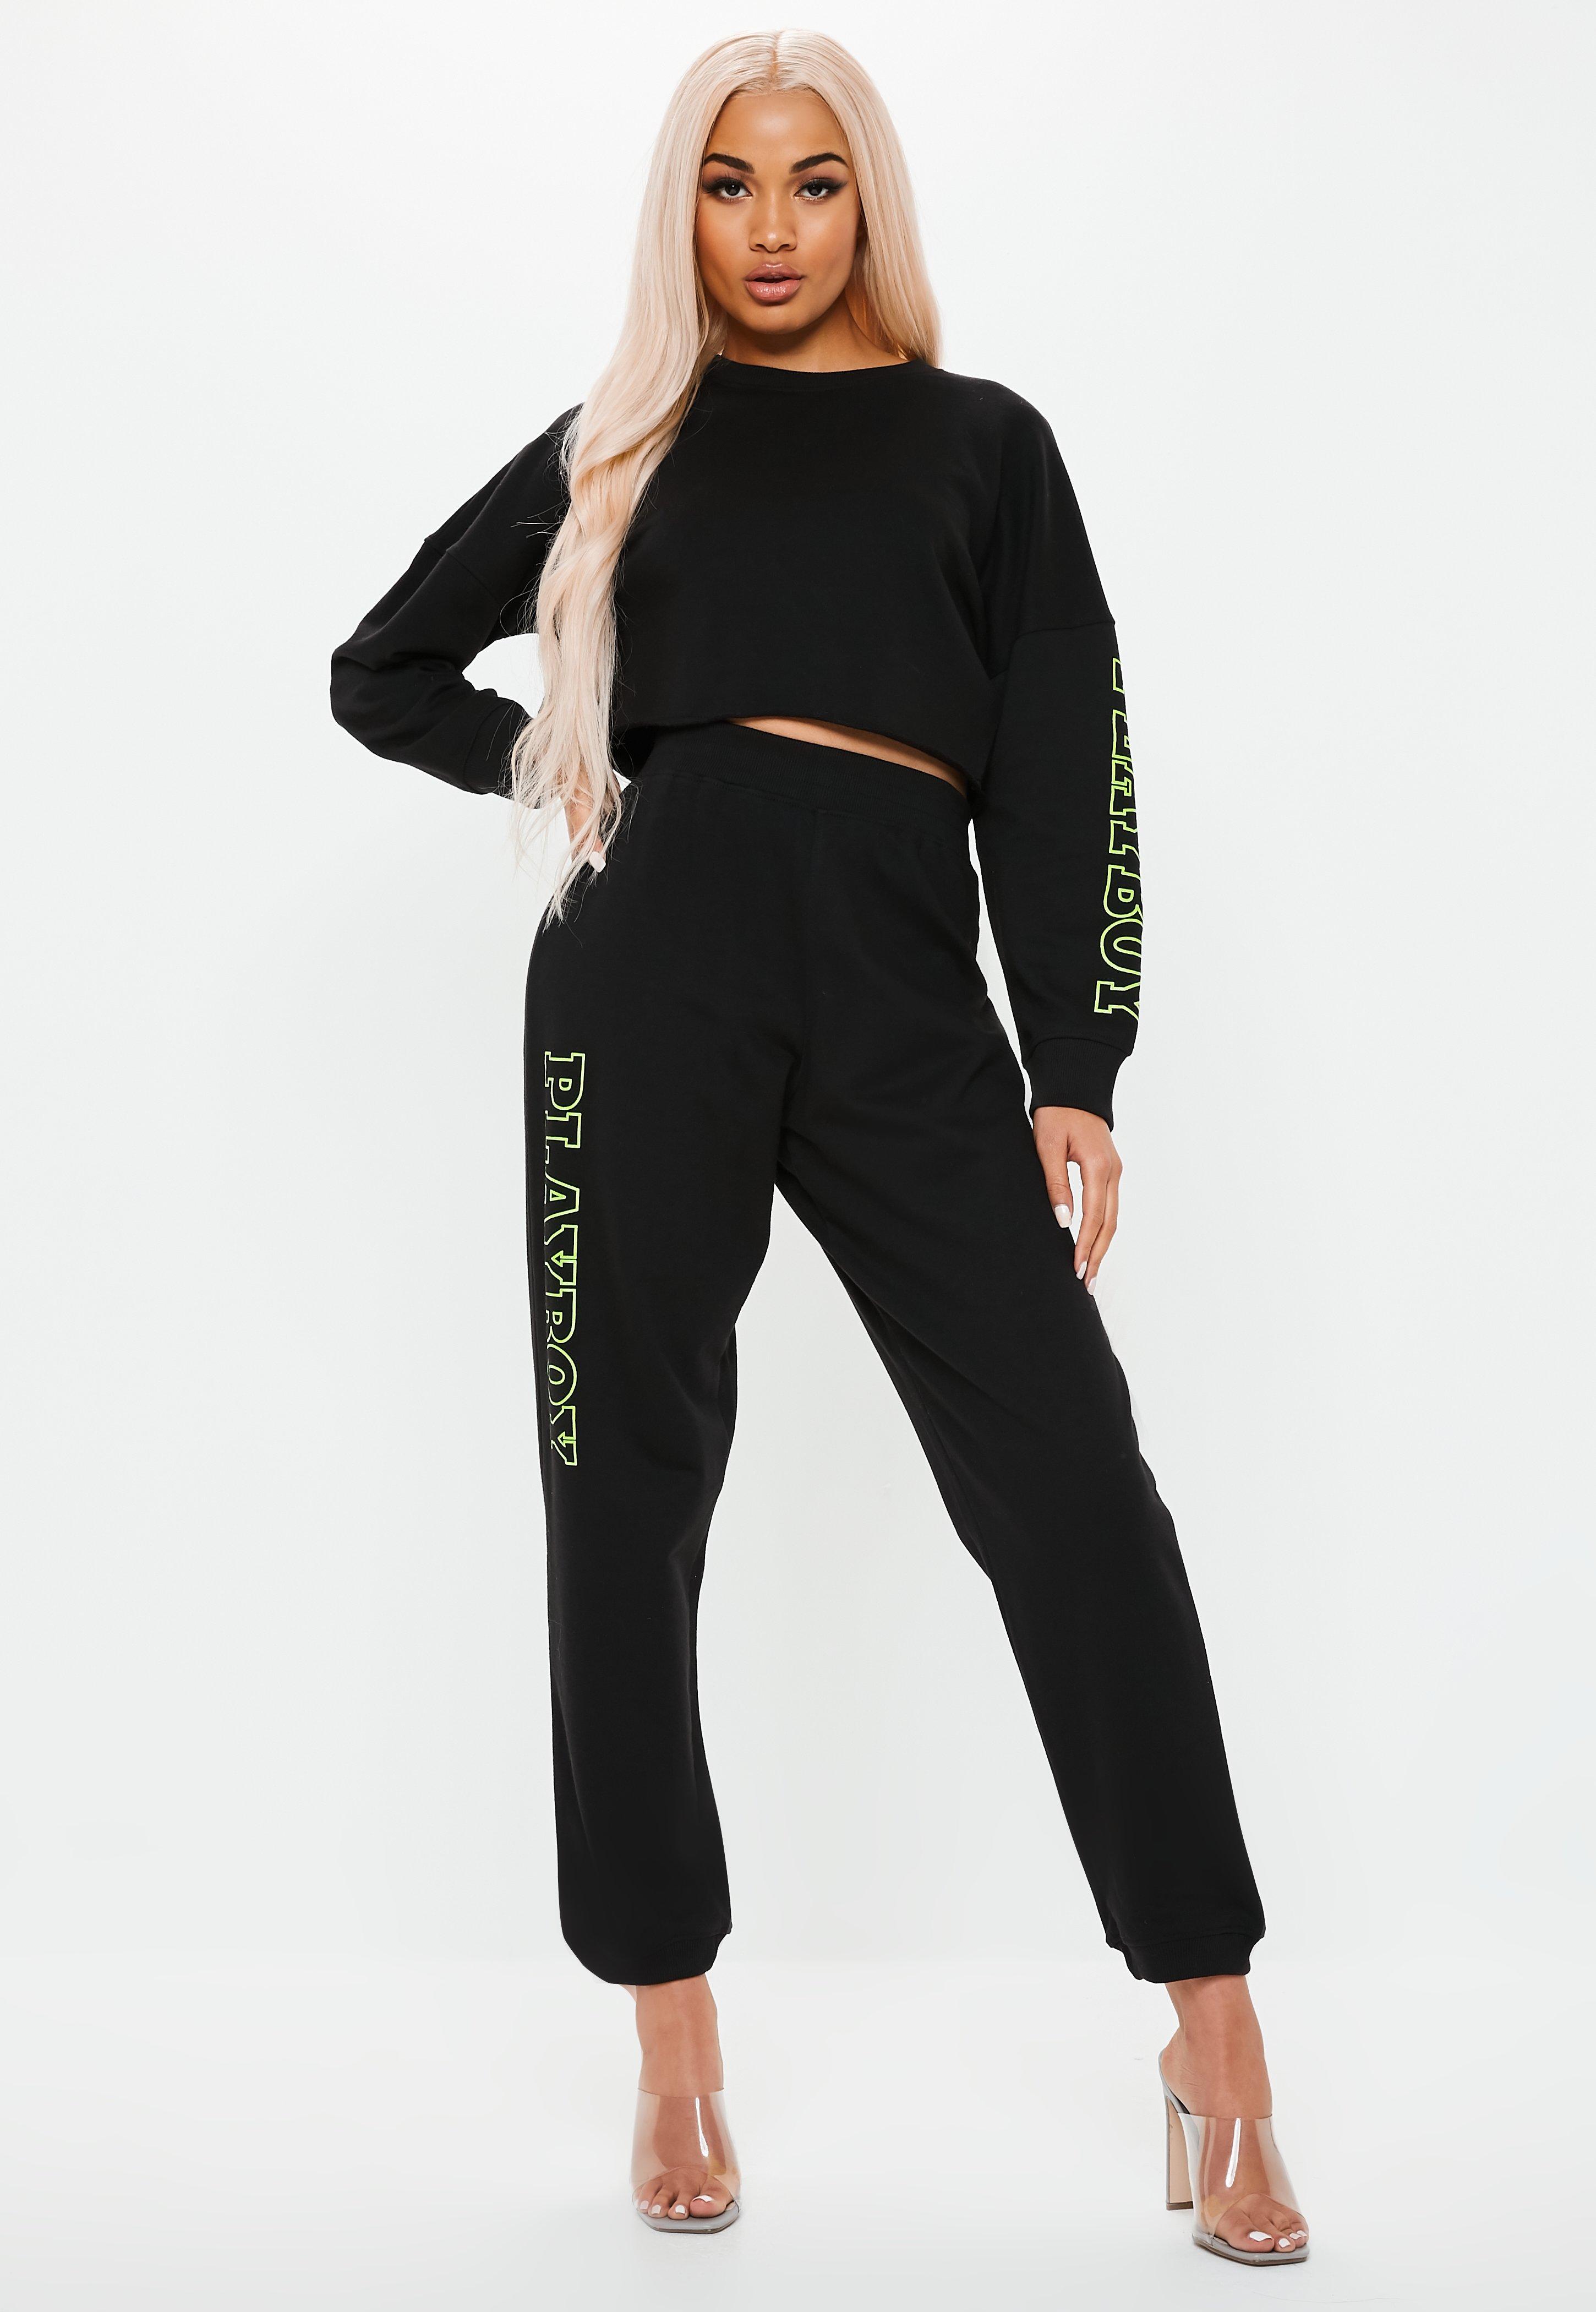 Missguided Sweatshirt Playboy Slogan Cropped X Black Sleeve srtdCQh